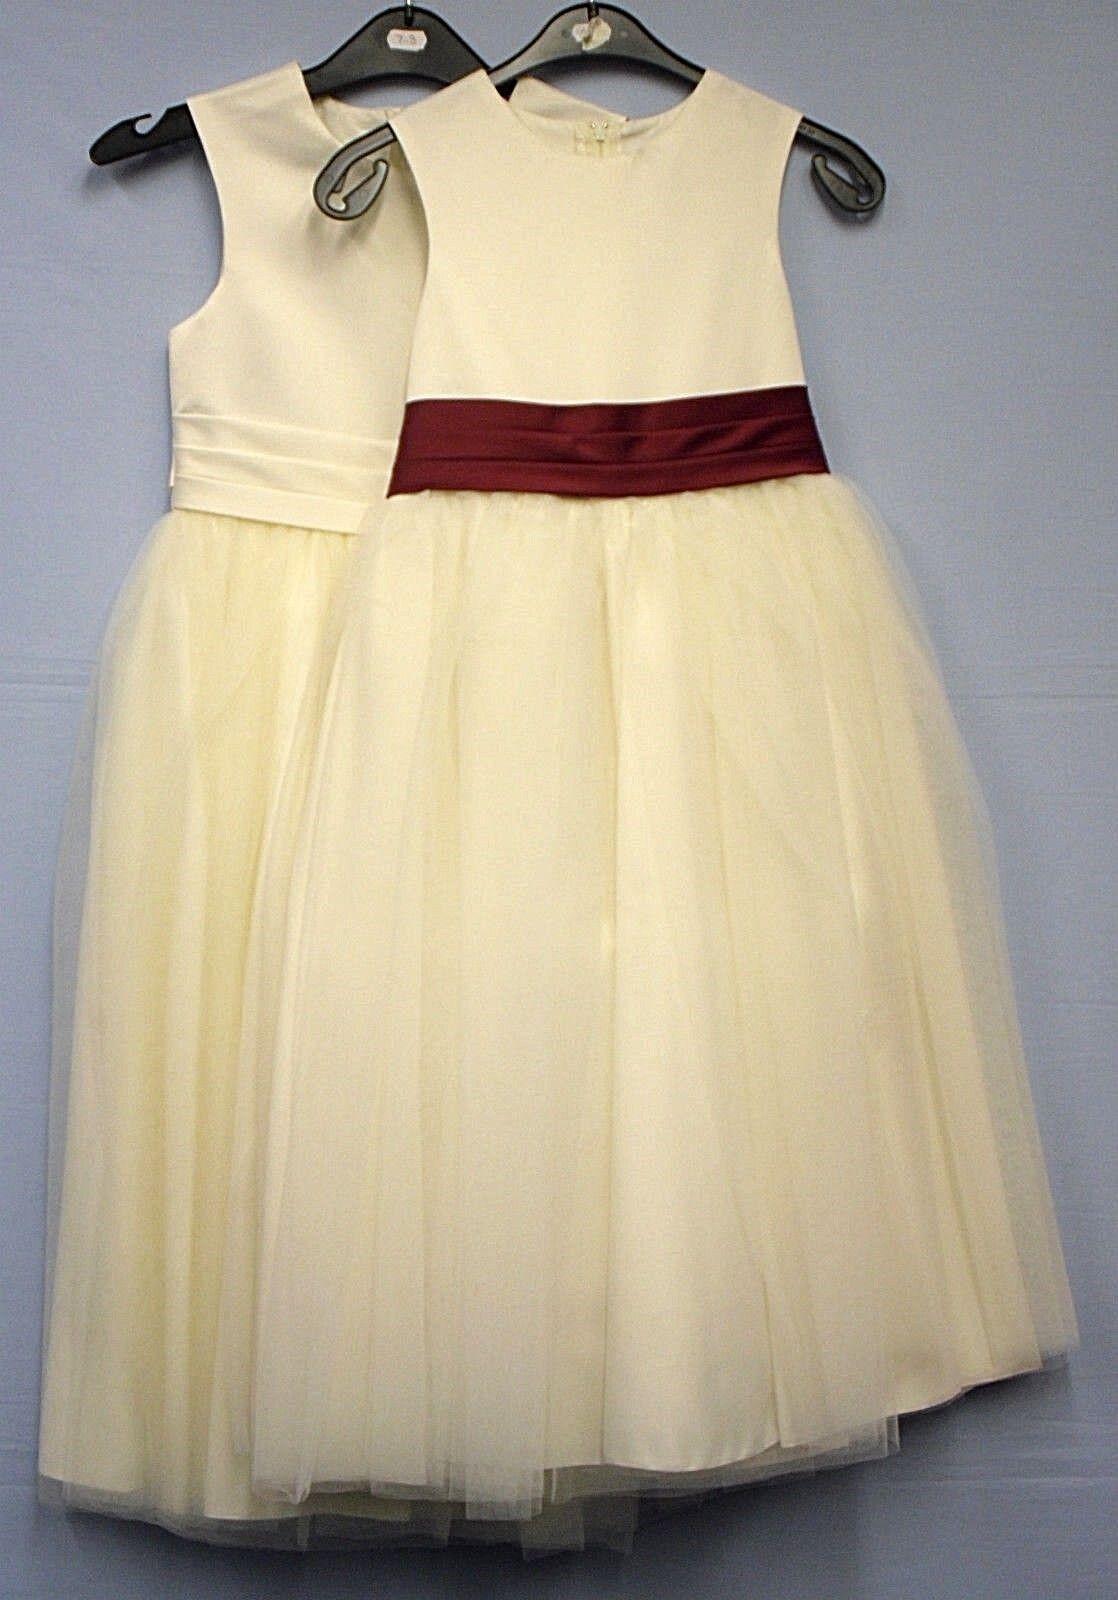 Childrens Girls Occasion Dress Cream Bridesmaid Wedding Formal Party 7-8 years